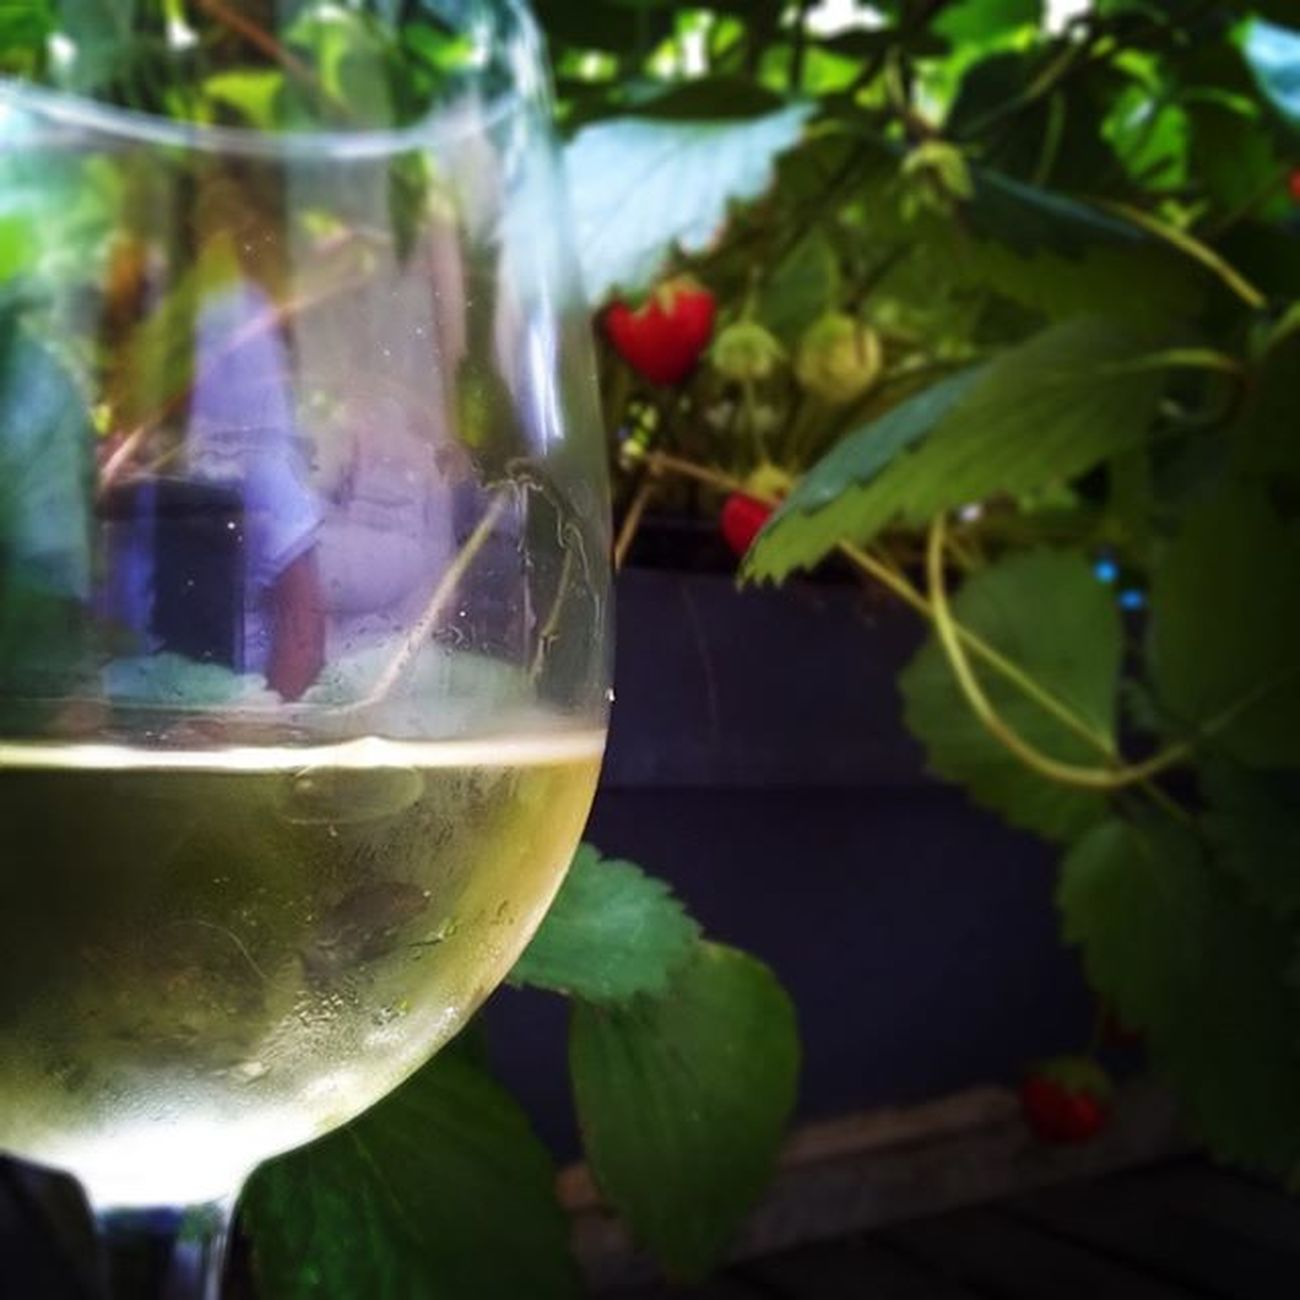 Gold. Locavore Withewine Instawine Home Strawberries Wine Winolife Lirac